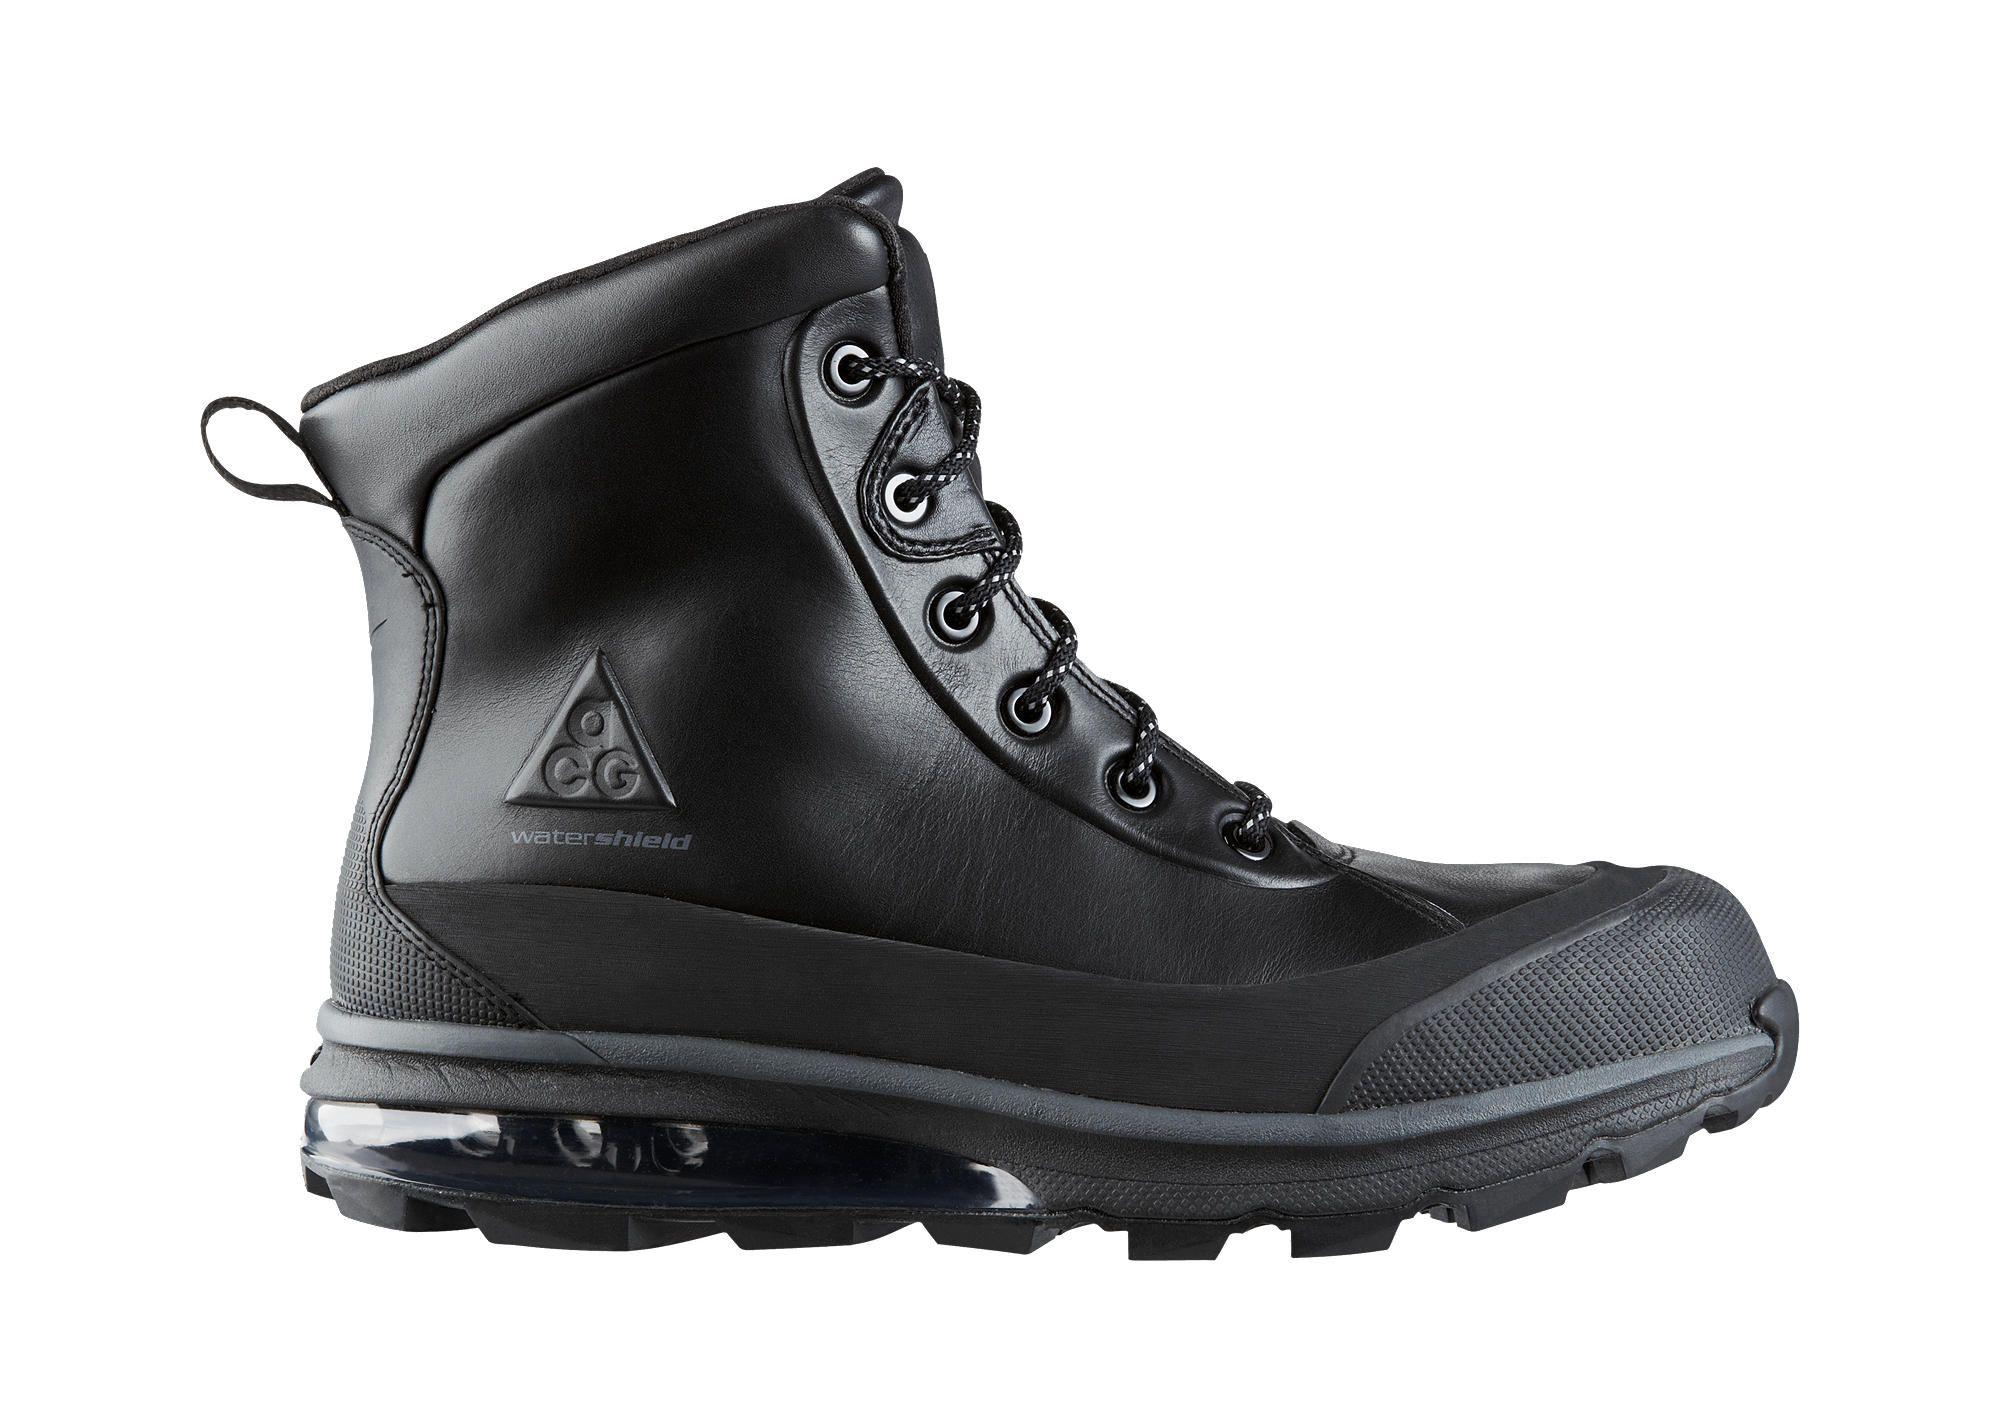 Nike Air Max ACG Conquer Men's Boot | Stiefel, Sportschuhe